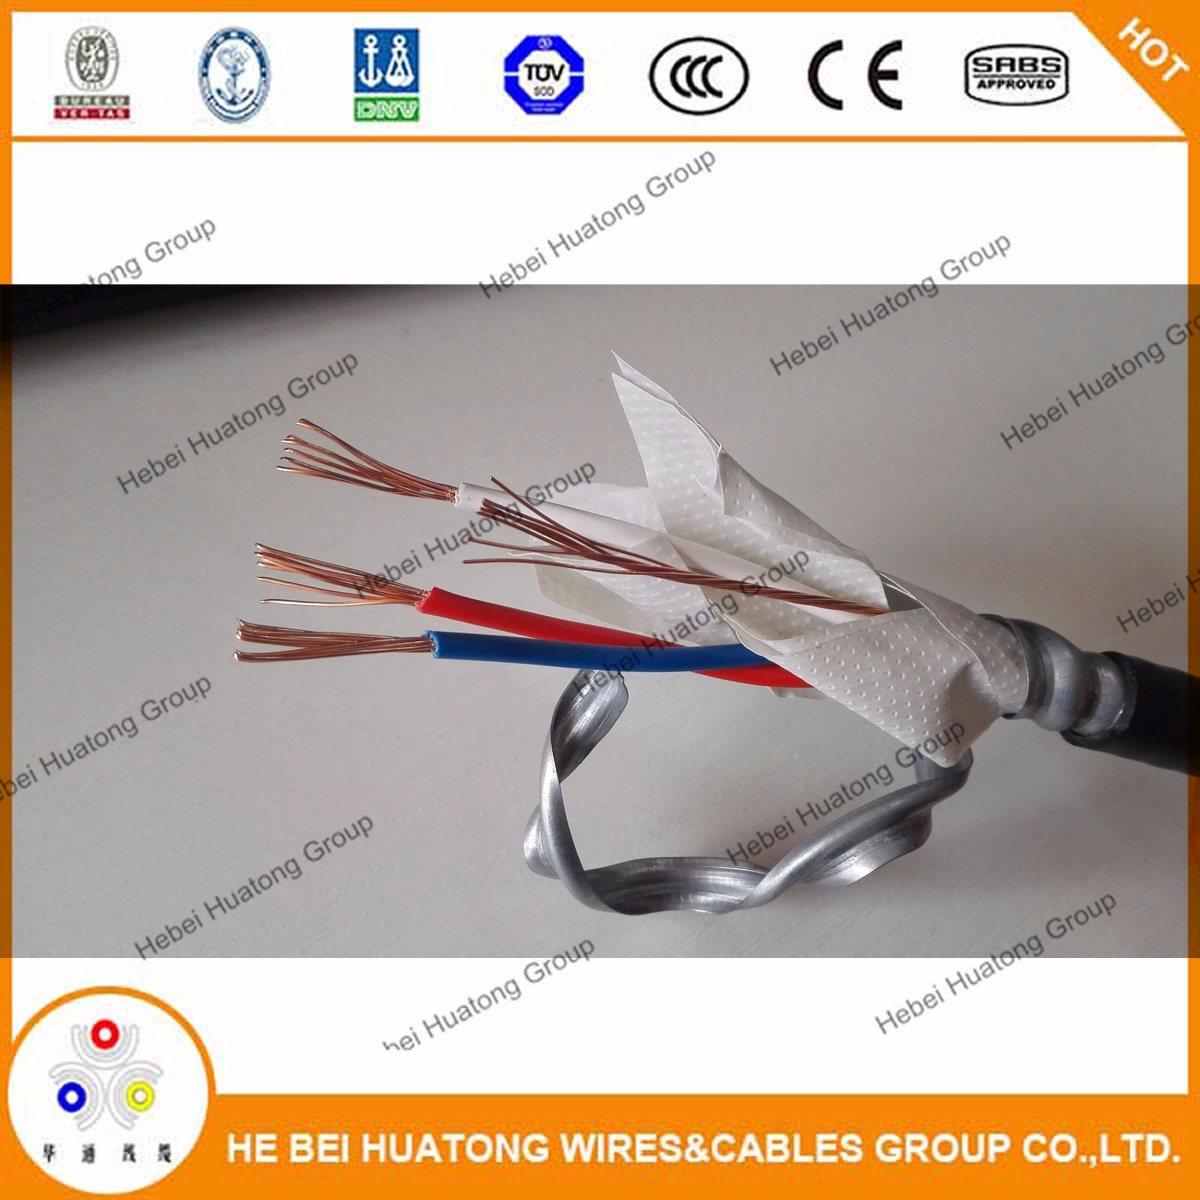 China Ul Certificate Ul83 1569 Standard 12 2 12 3 10 2 10